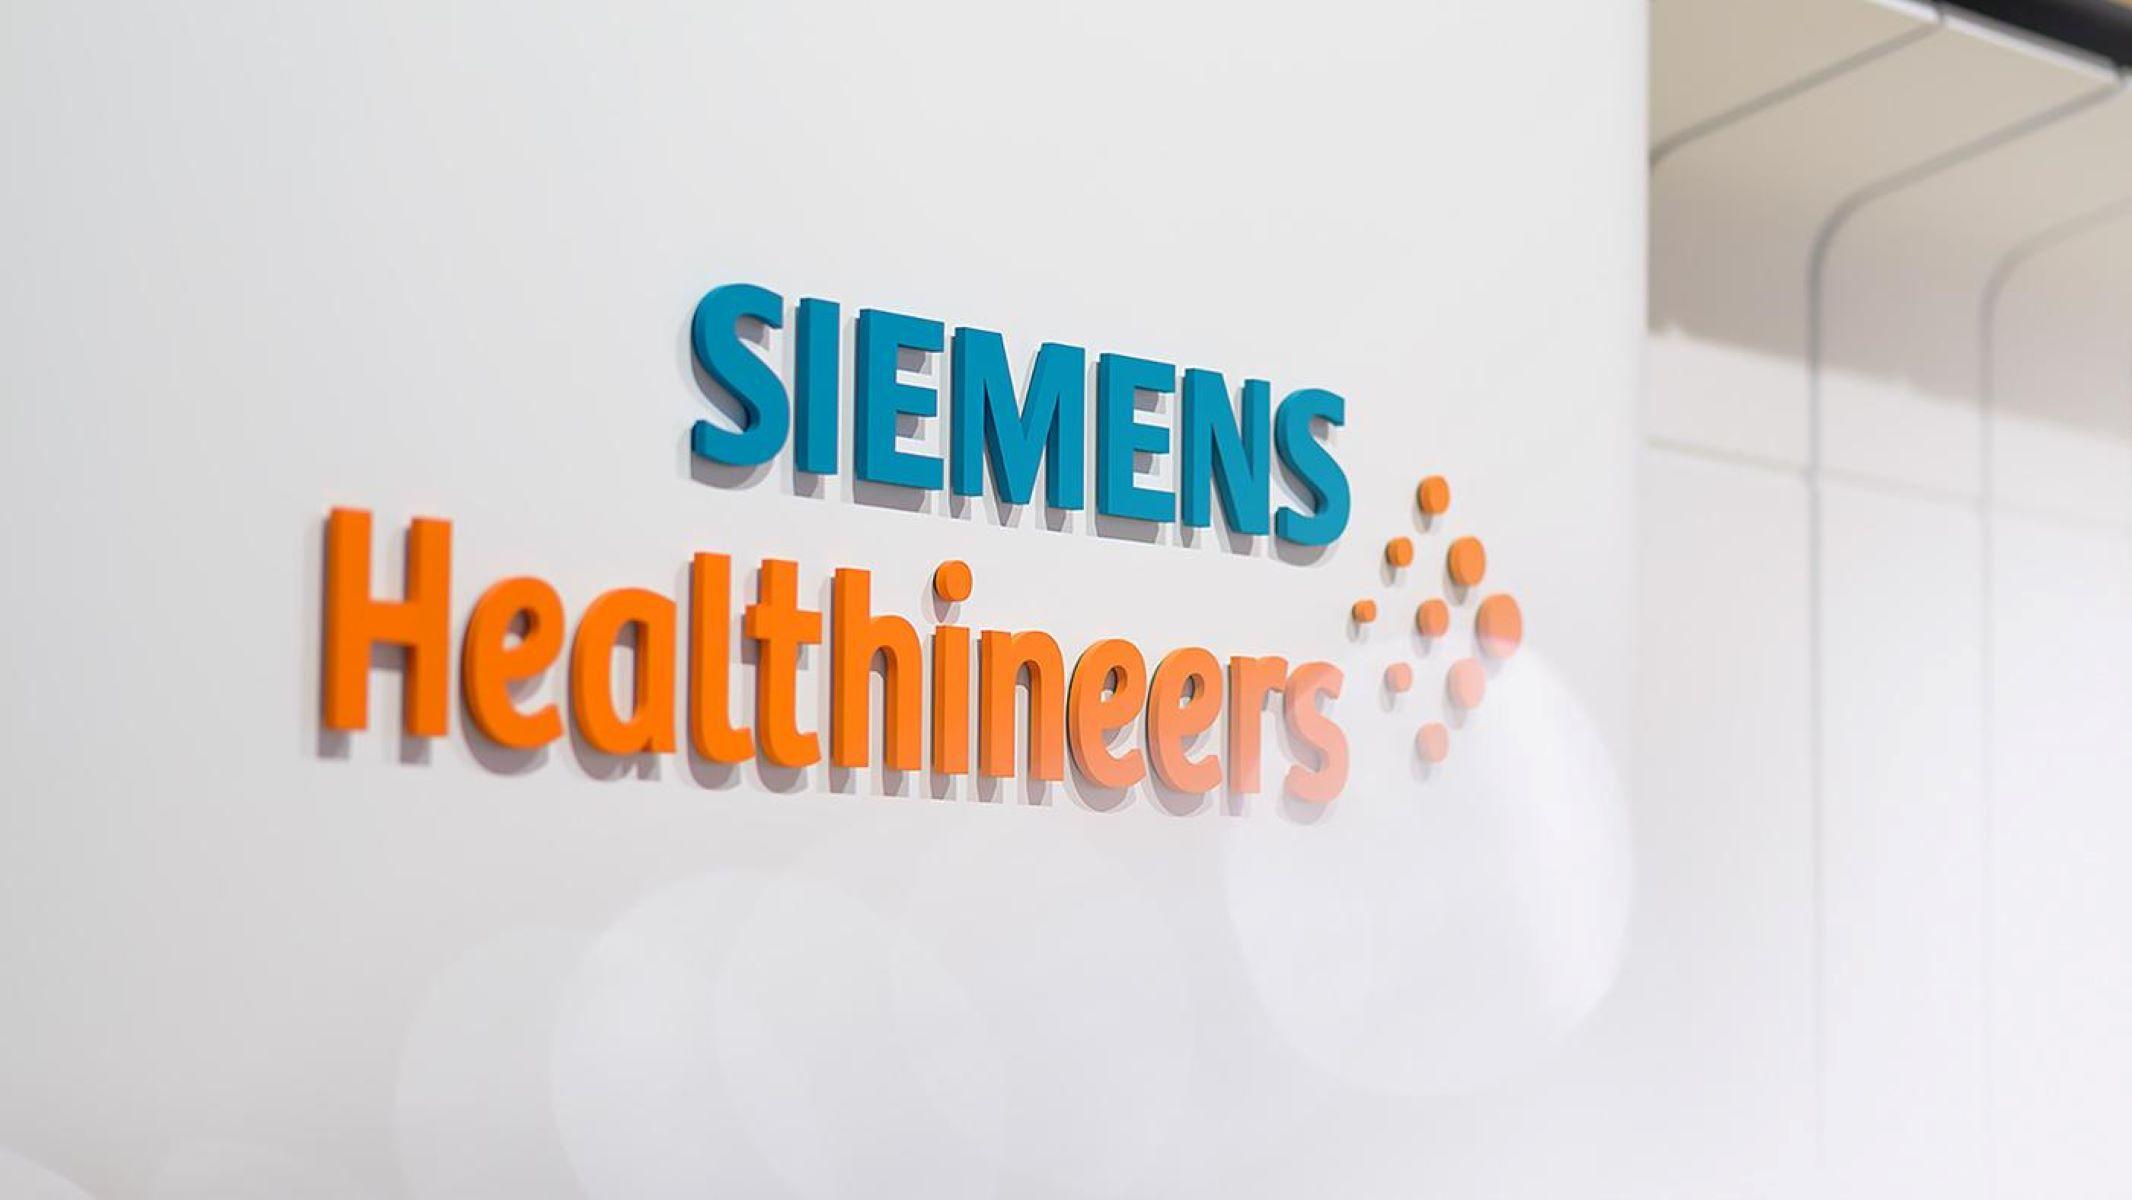 Siemens Healthineers: Νέα κλινικά πεδία με τον μικρότερο μαγνητικό τομογράφο